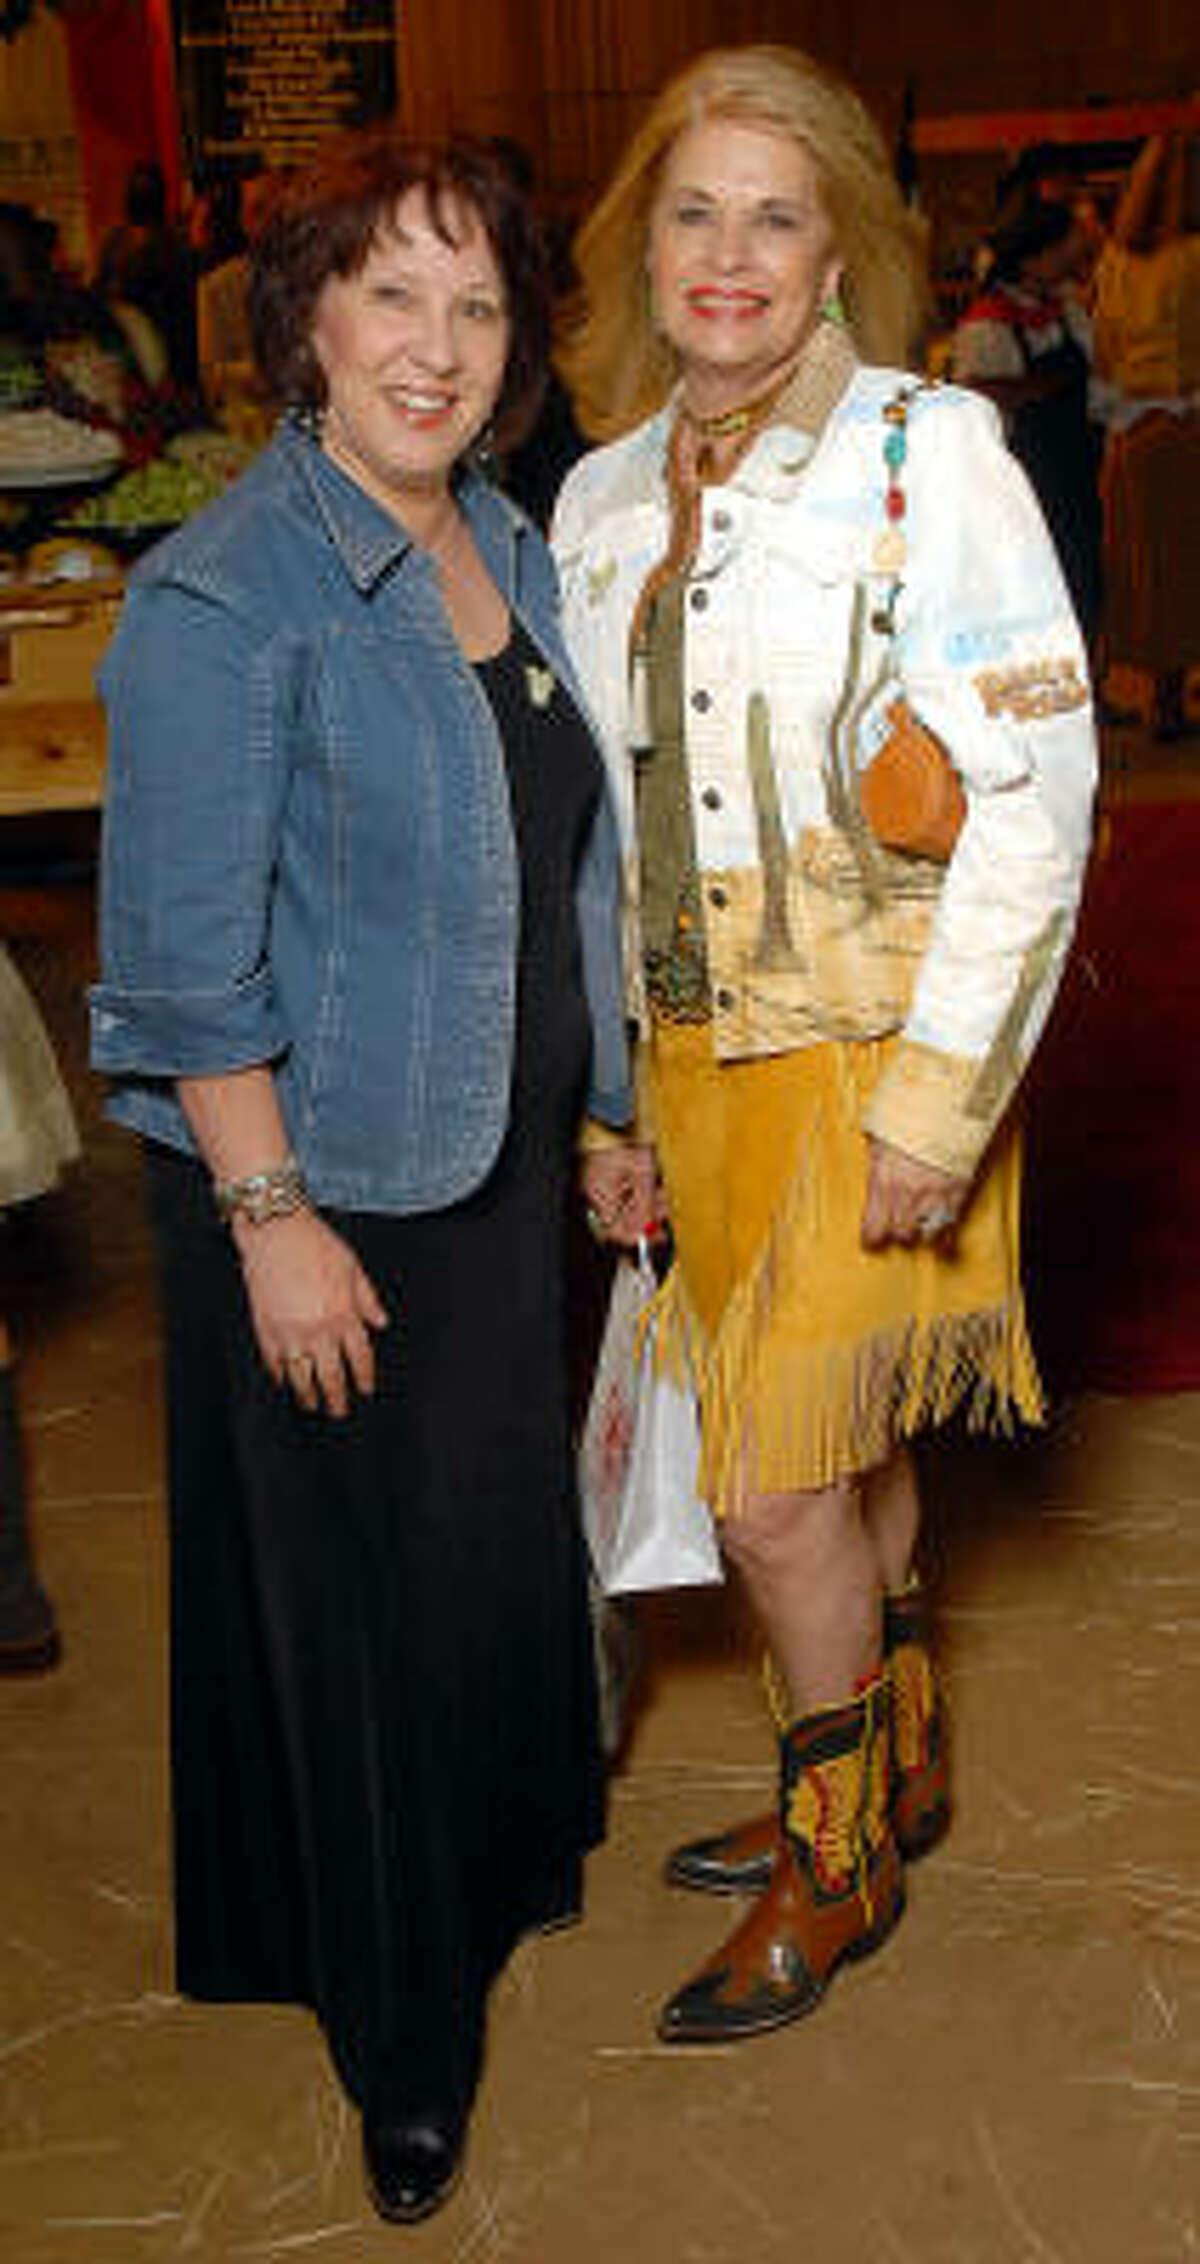 Jean Leonetti and Cookie Michael